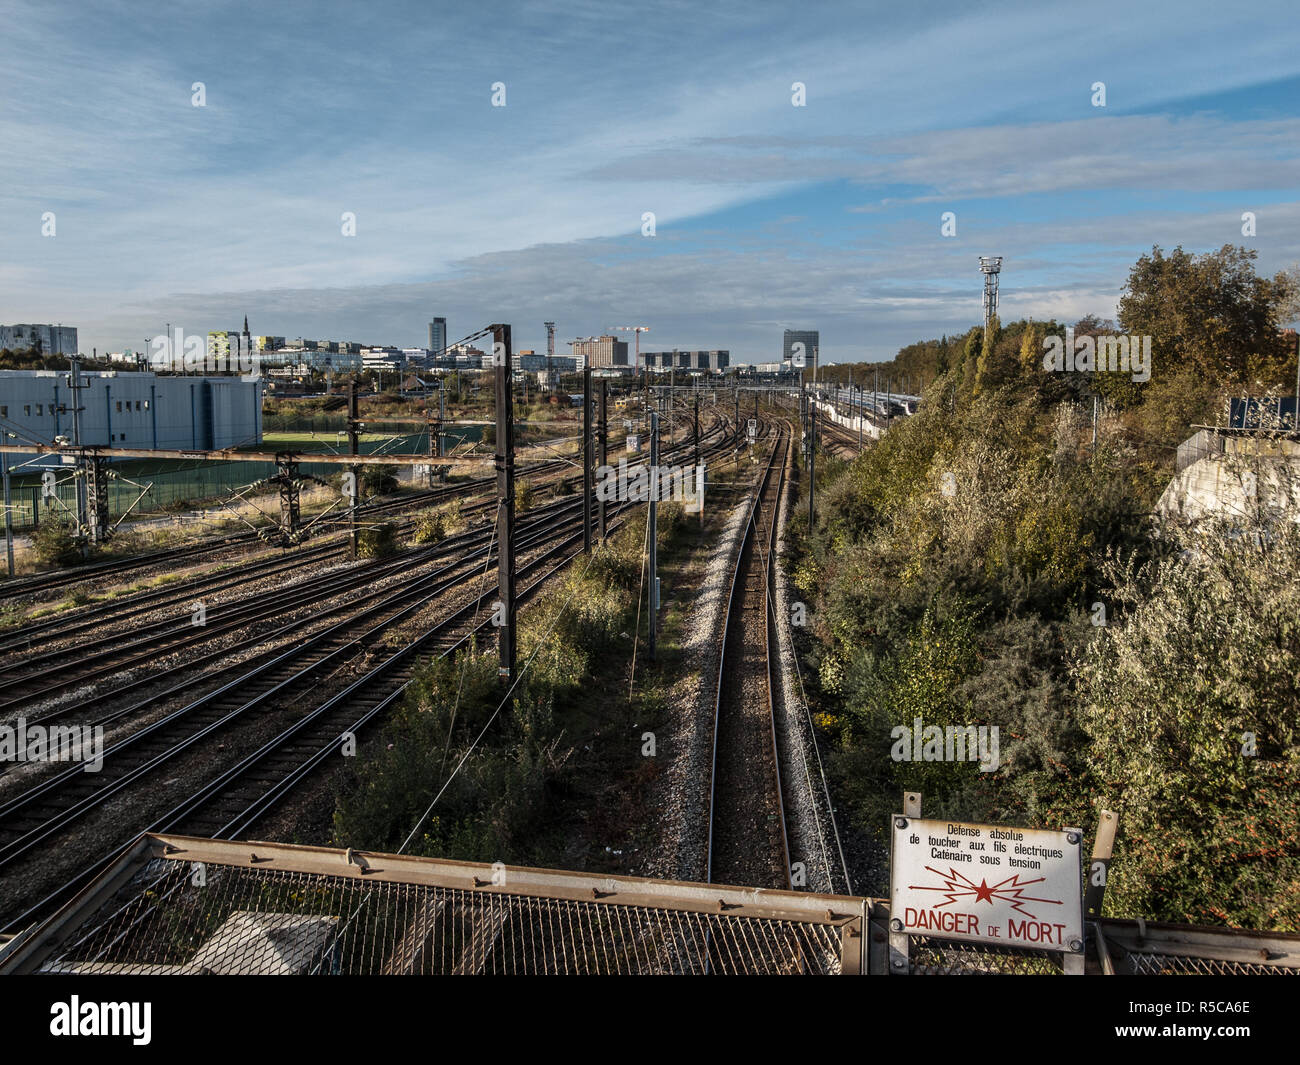 LILLE TRAIN LINES GOING TO LILLE FLANDRES STATION - LILLE TRAIN - LILLE TRANSPORT - FRENCH TRAIN - REGION HAUTS DE FRANCE @ Frédéric BEAUMONT - Stock Image